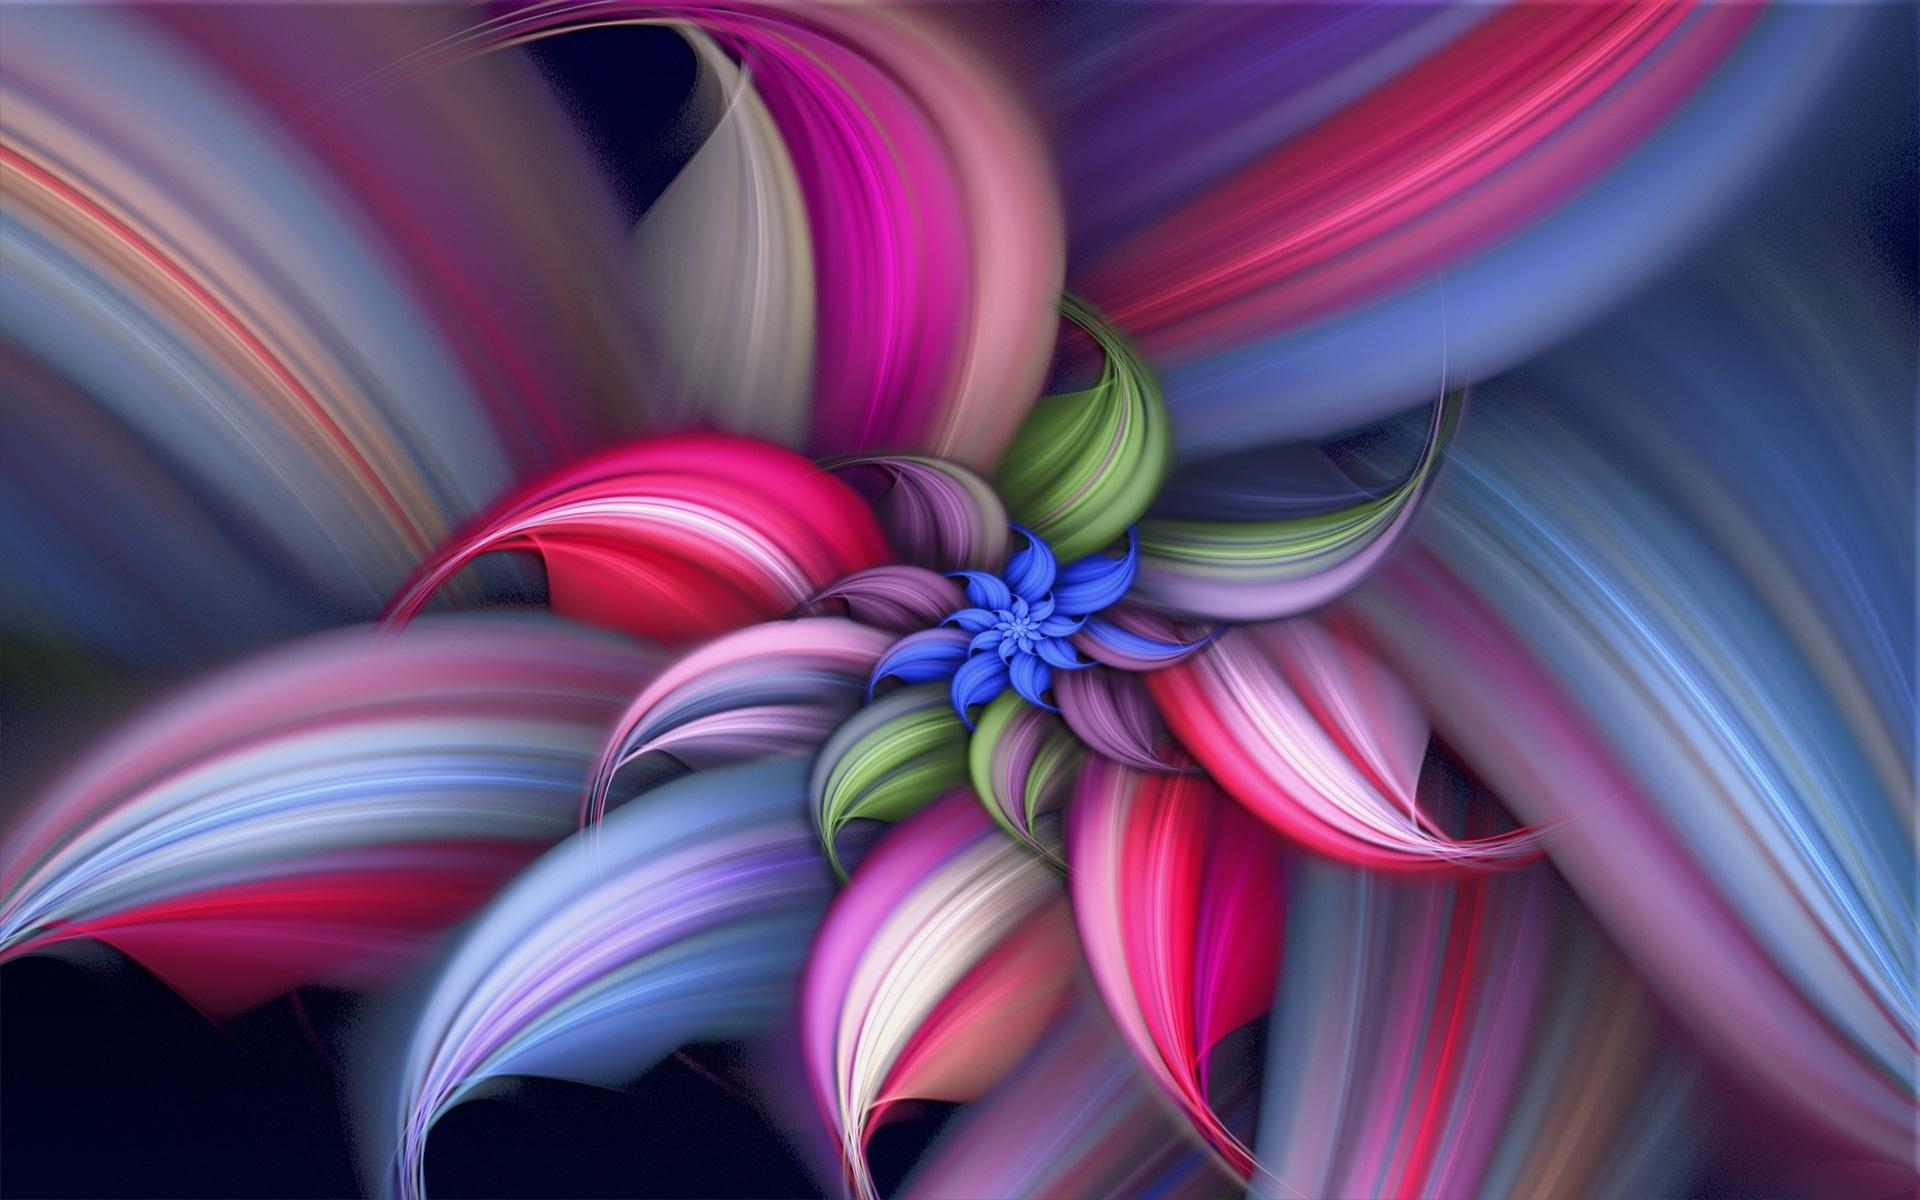 Free download Desktop Wallpaper hd 3D Full Screen Flowers